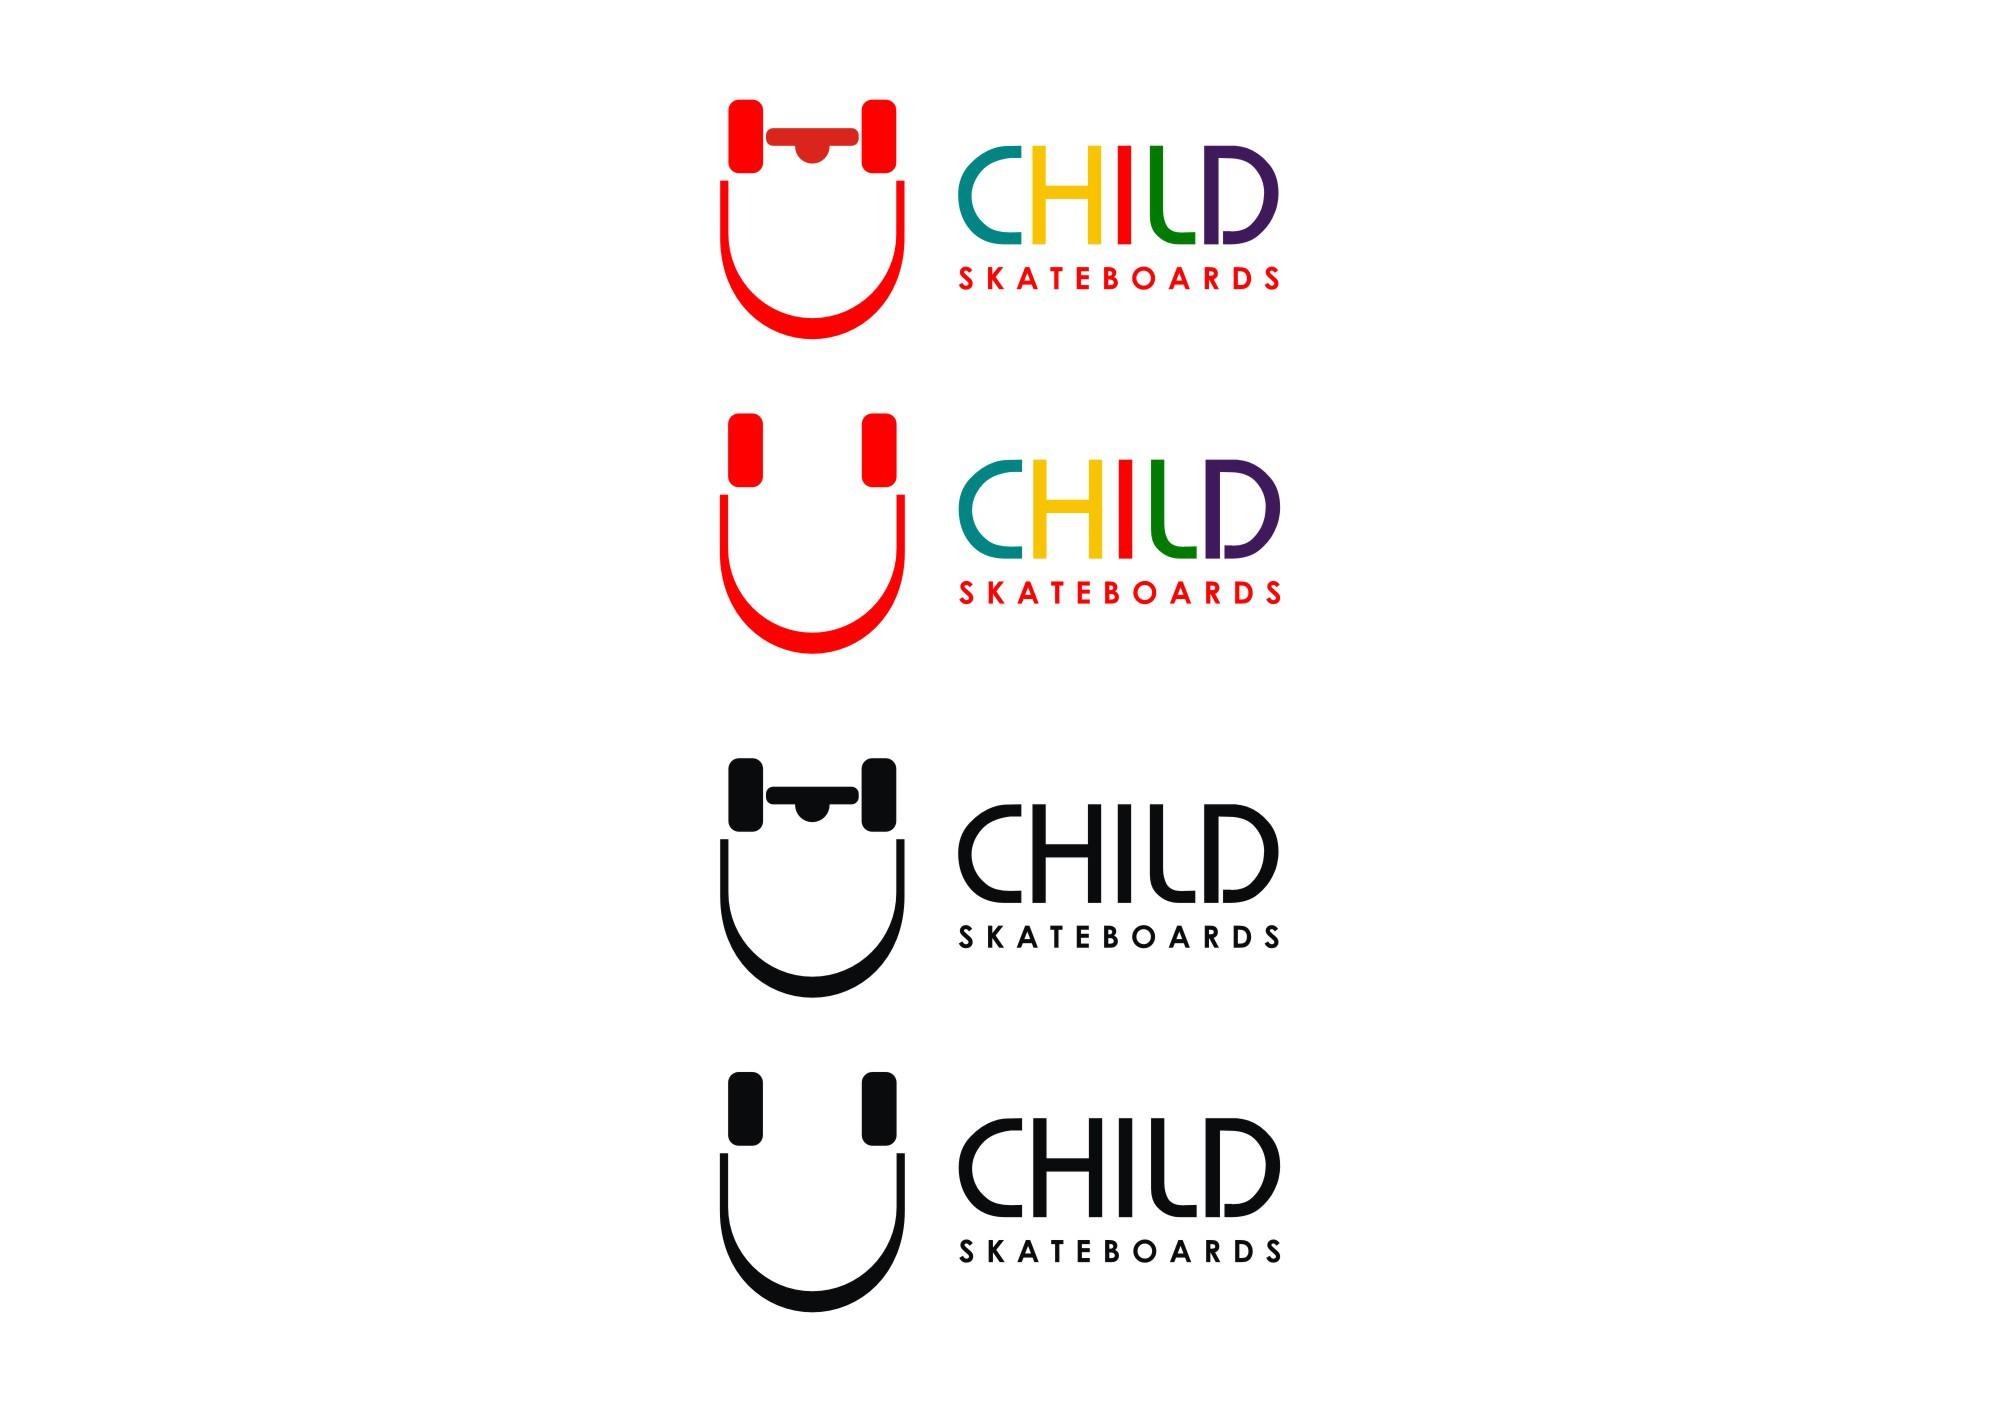 Mature and Modern Logo Design for a Skateboarding Shop!!/ スケートボードブランドのセレクトショップ「CHILD」のロゴ